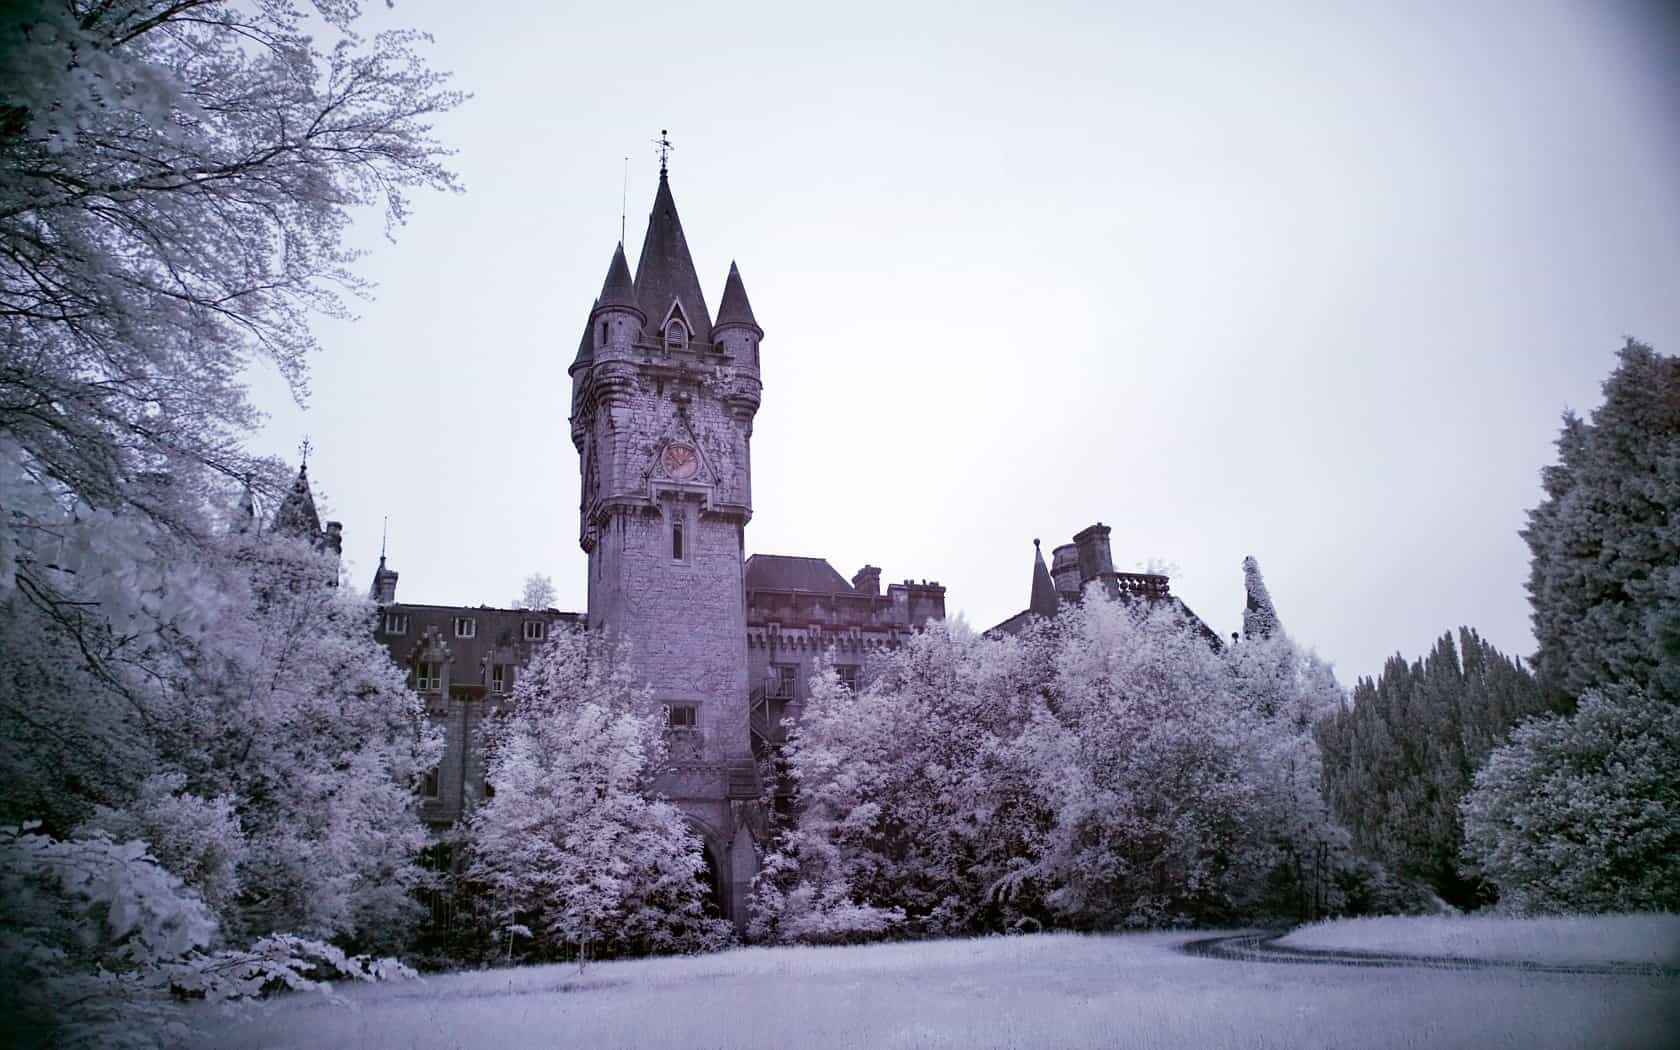 Castle Wallpaper 011